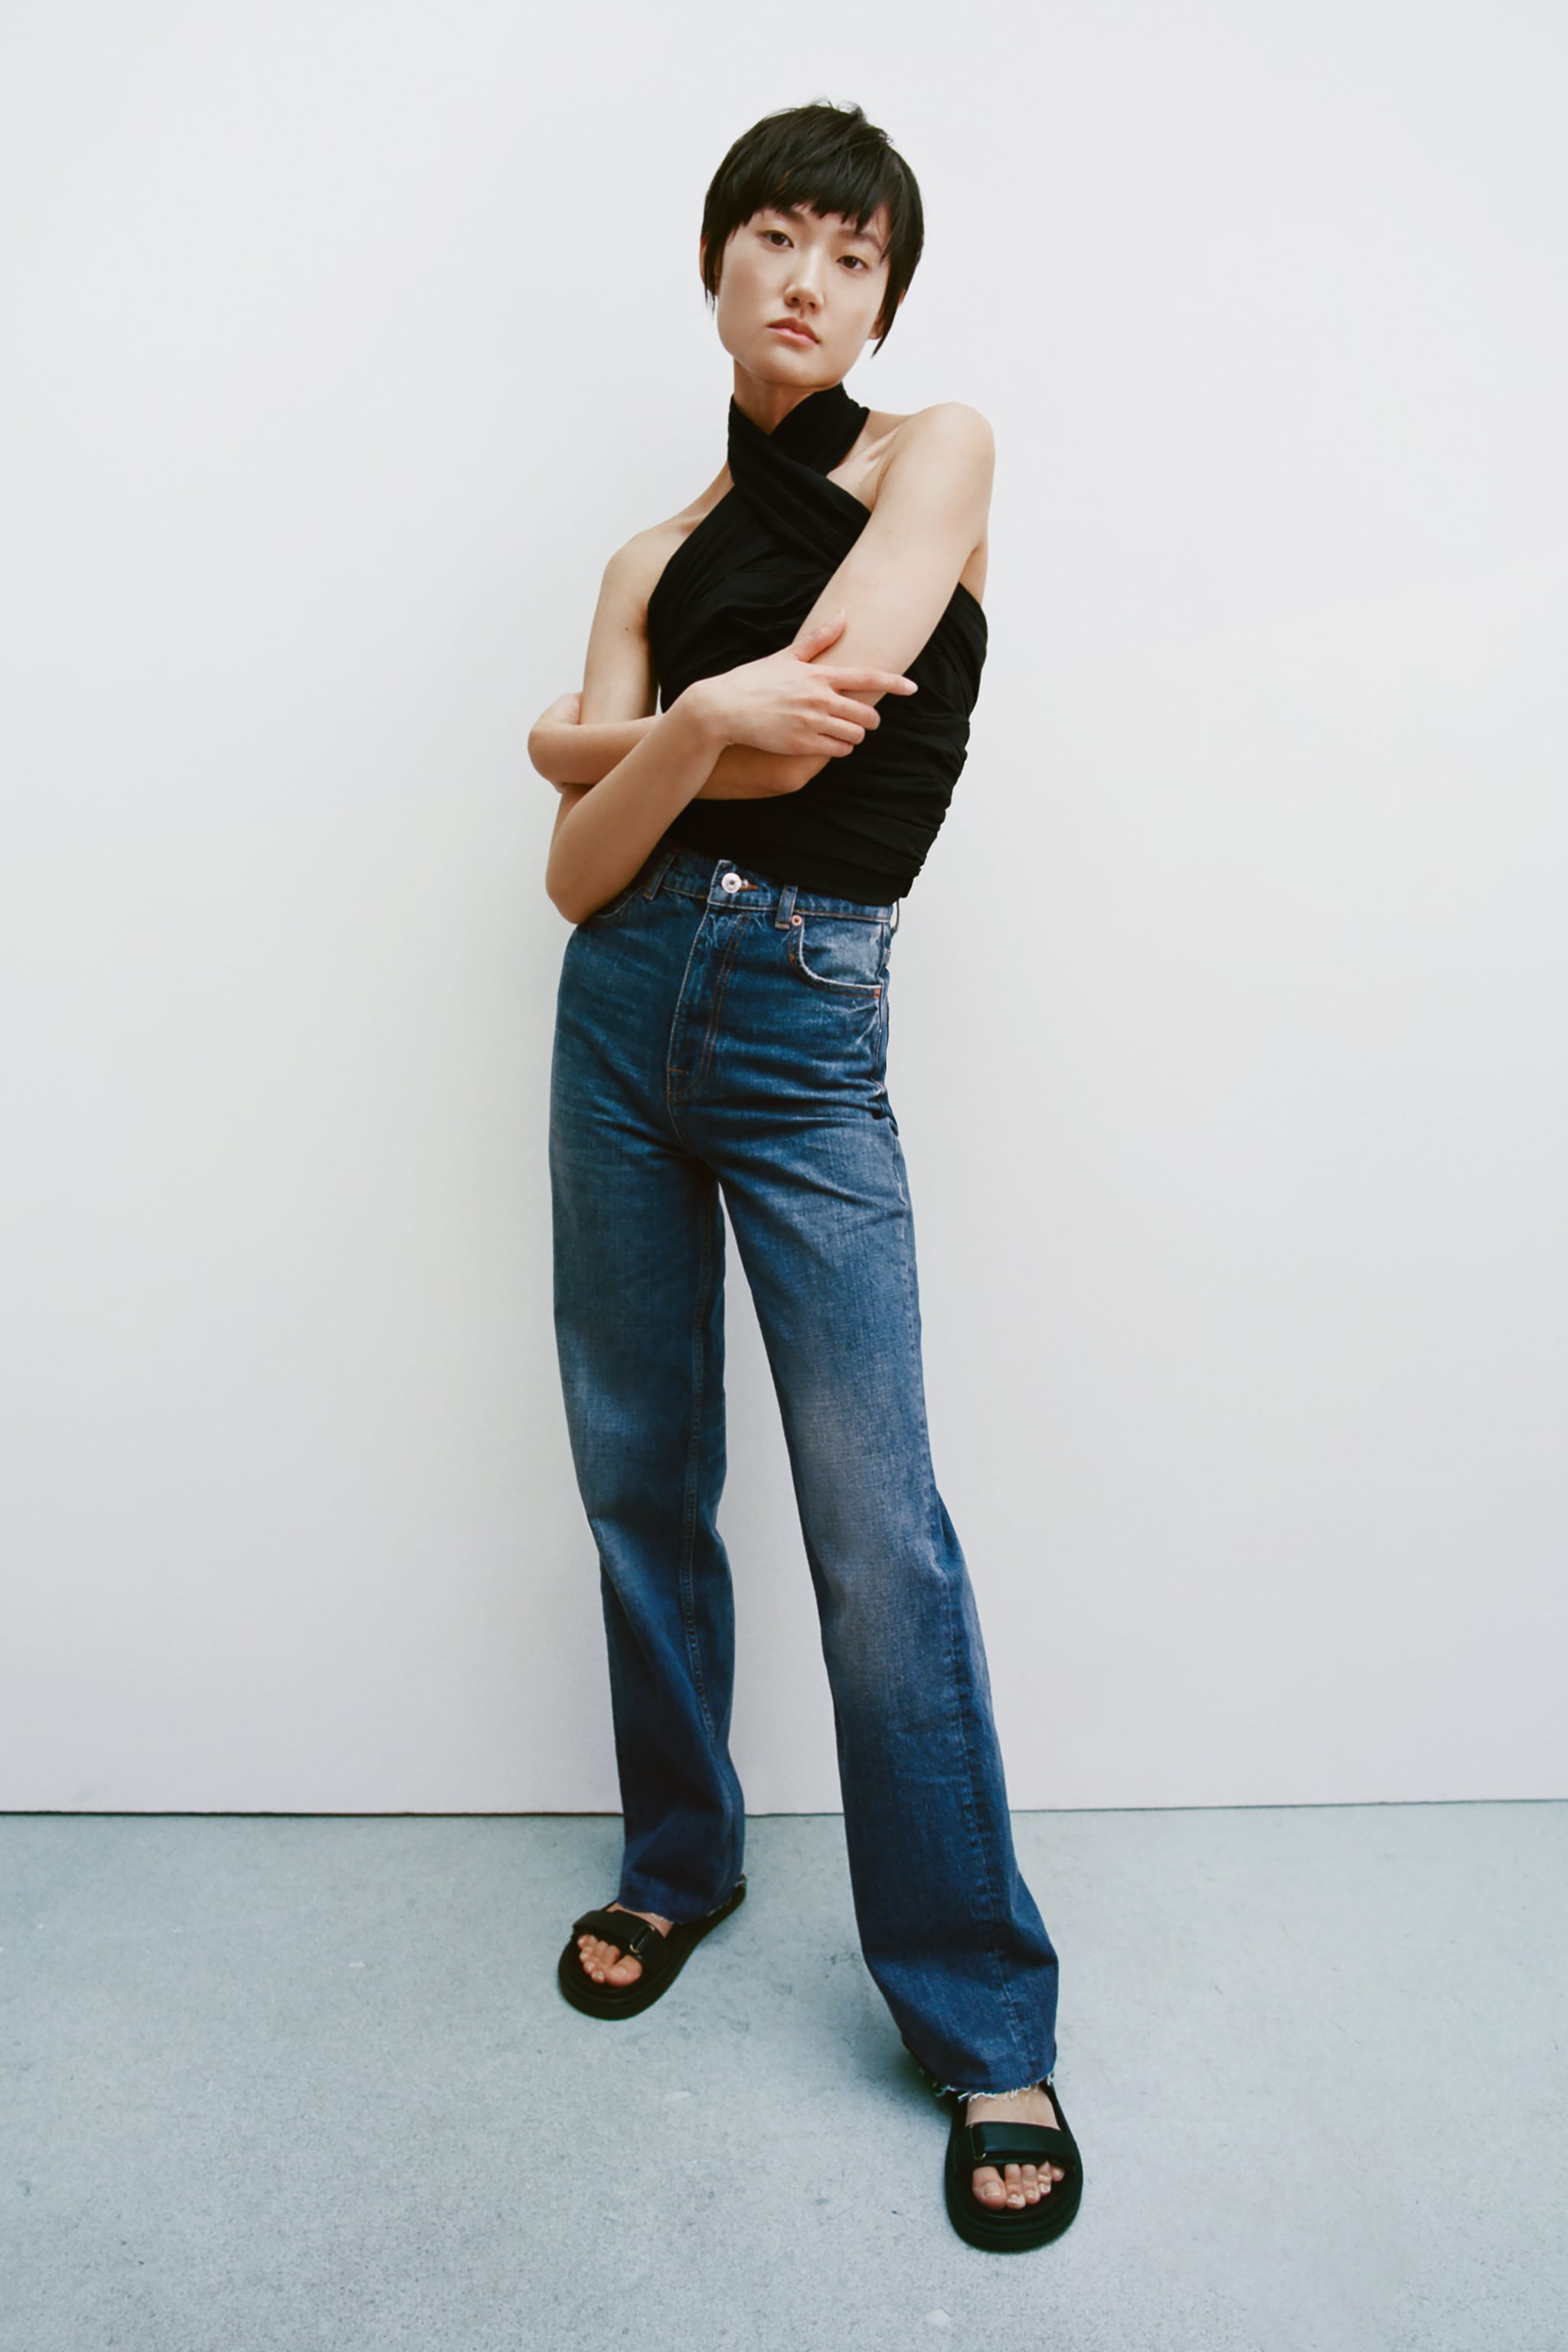 Zara ADHESIVE STRAP LOW HEEL LEATHER SANDALS